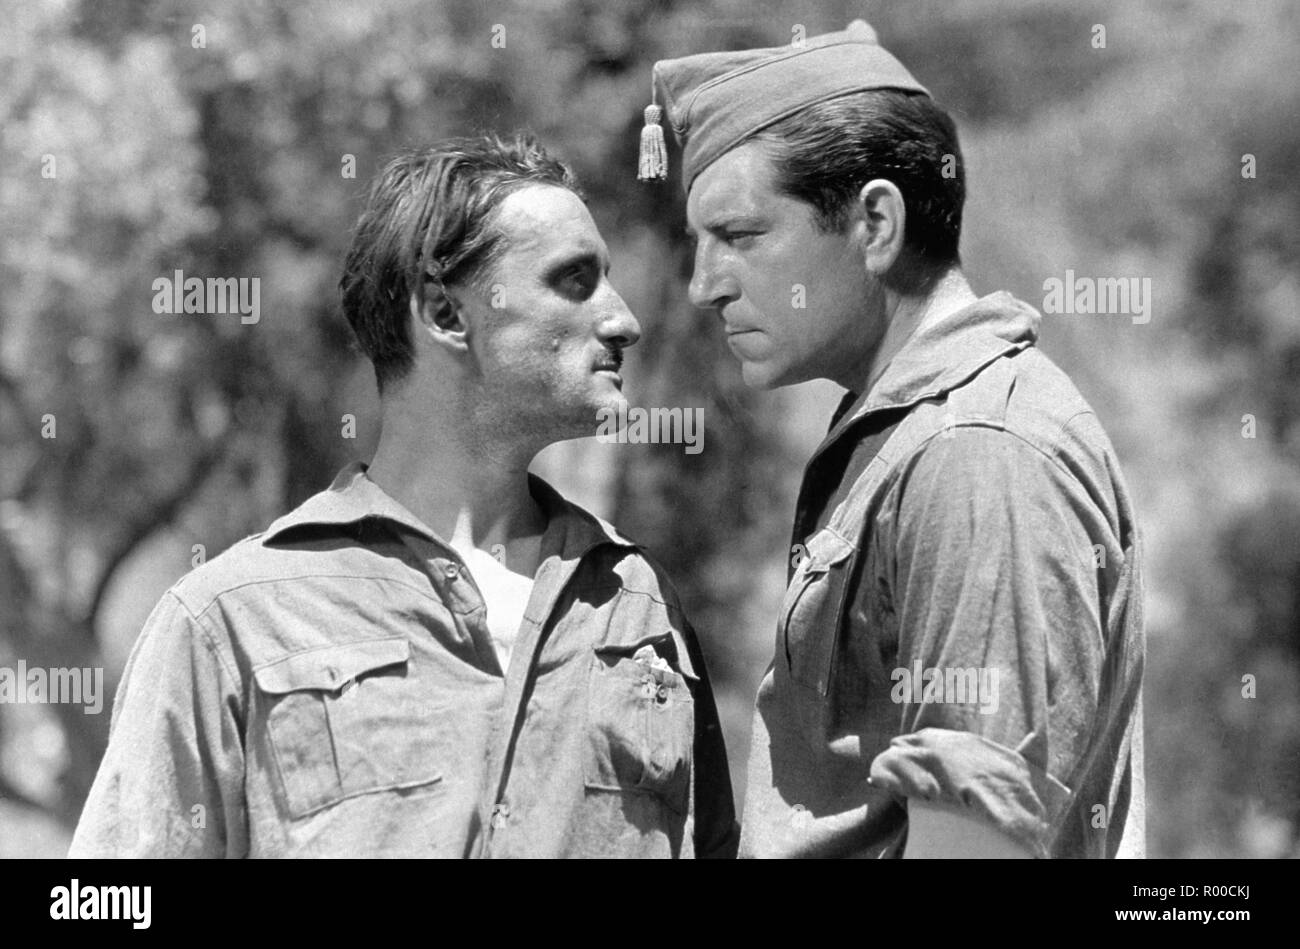 La Bandera Year : 1935 - France Director : Julien Duvivier Jean Gabin, Robert LeVigan - Stock Image